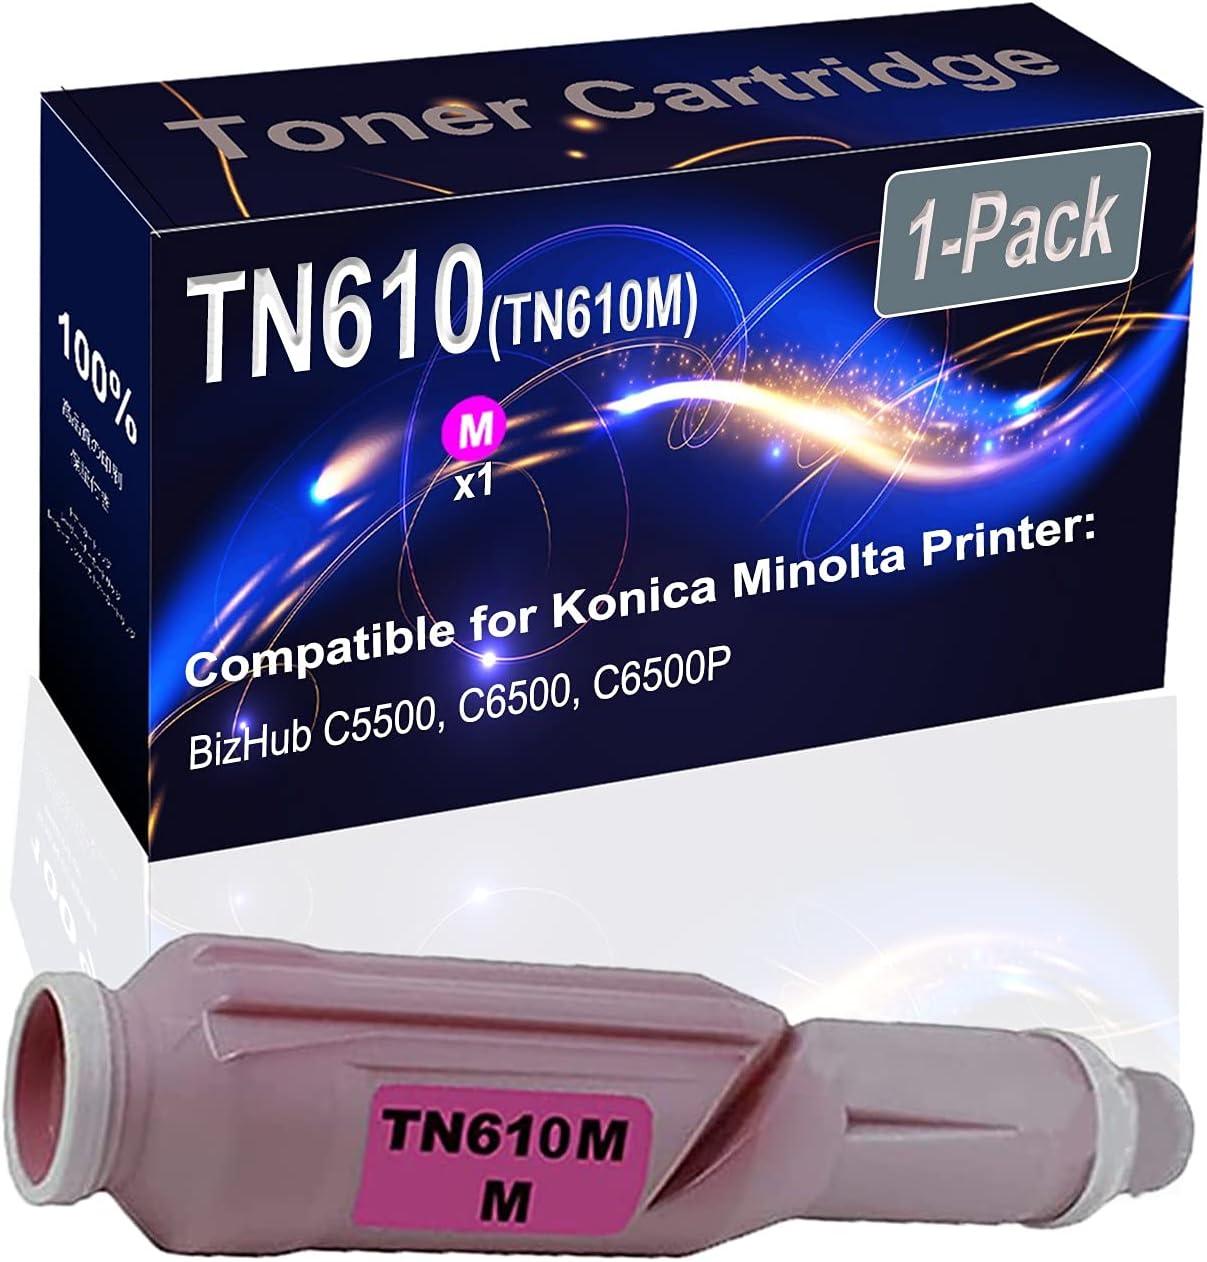 1-Pack (Magenta) Compatible BizHub C5500 C6500 Laser Toner Cartridge (High Capacity) Replacement for Konica Minolta TN610 (TN610M) Printer Toner Cartridge